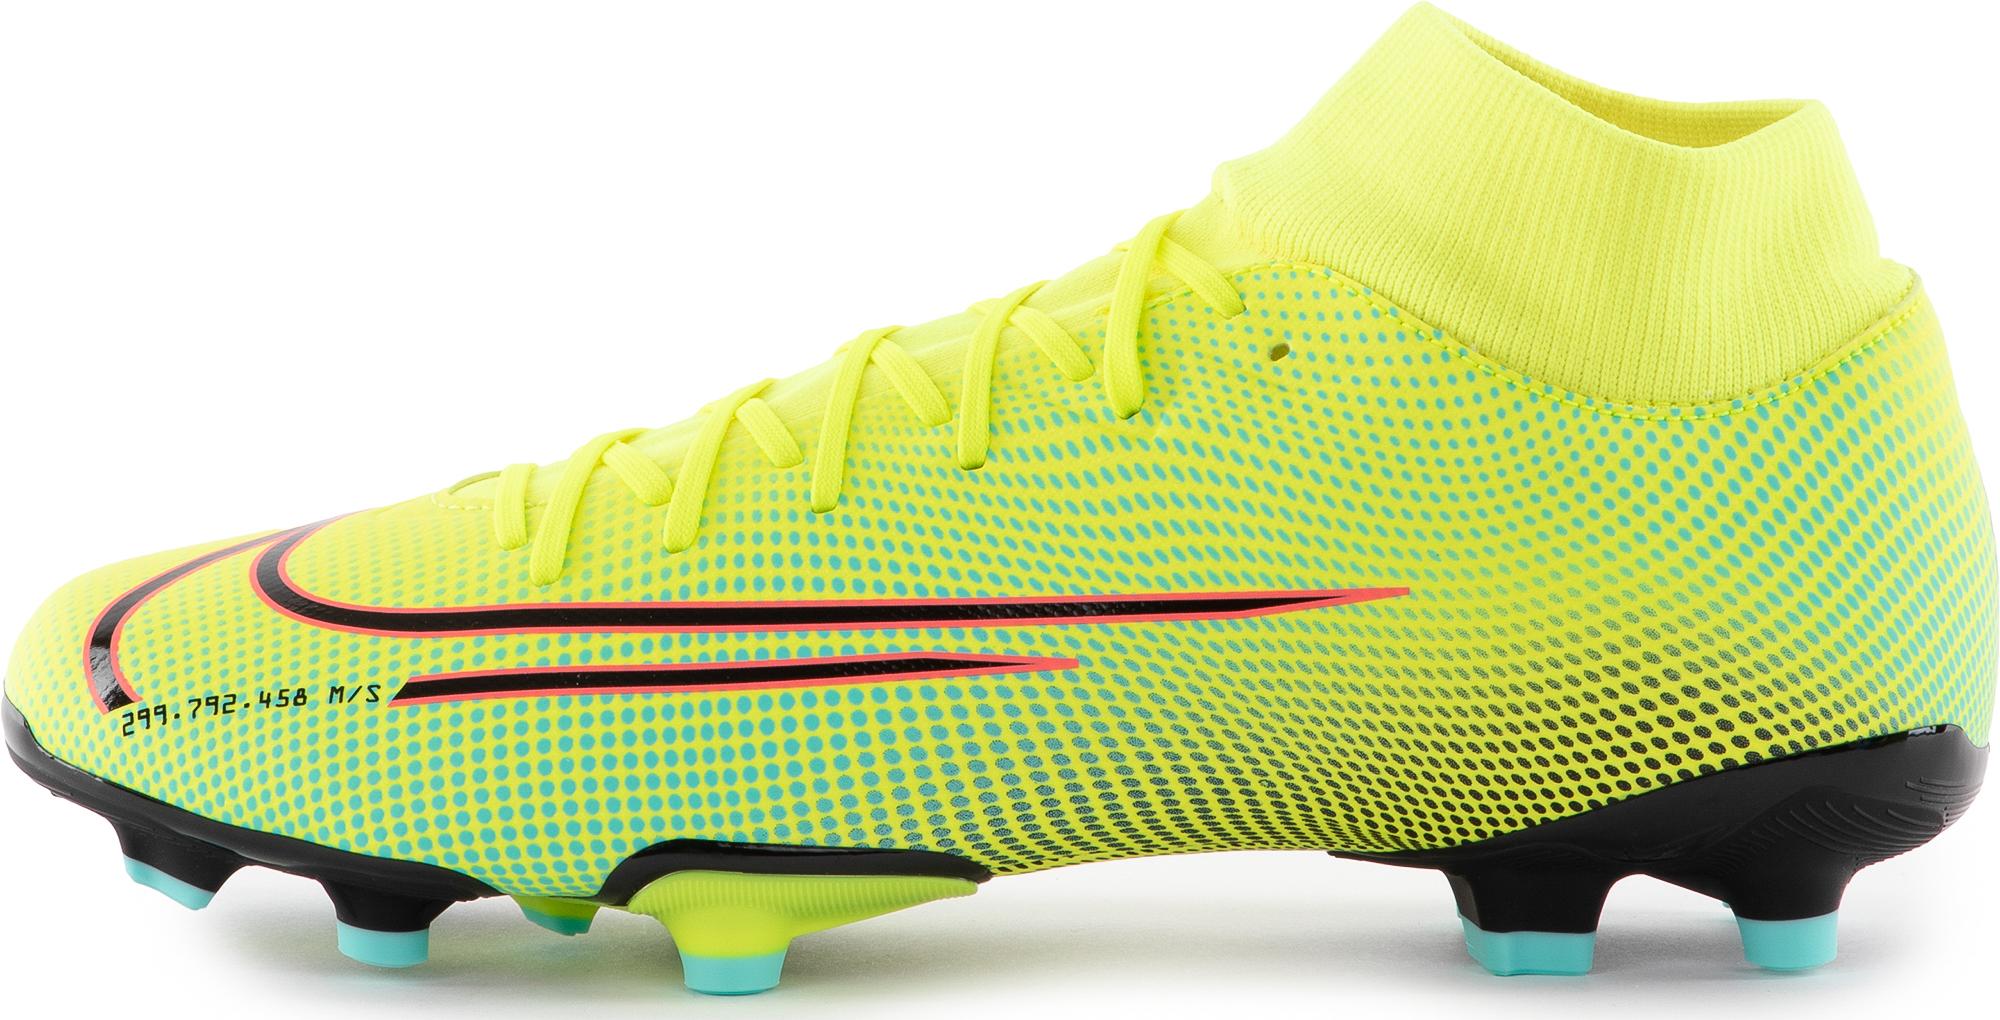 Nike Бутсы мужские Nike Mercurial Superfly 7 Academy MDS MG, размер 39.5 nike бутсы мужские nike mercurial superfly 7 academy mds mg размер 44